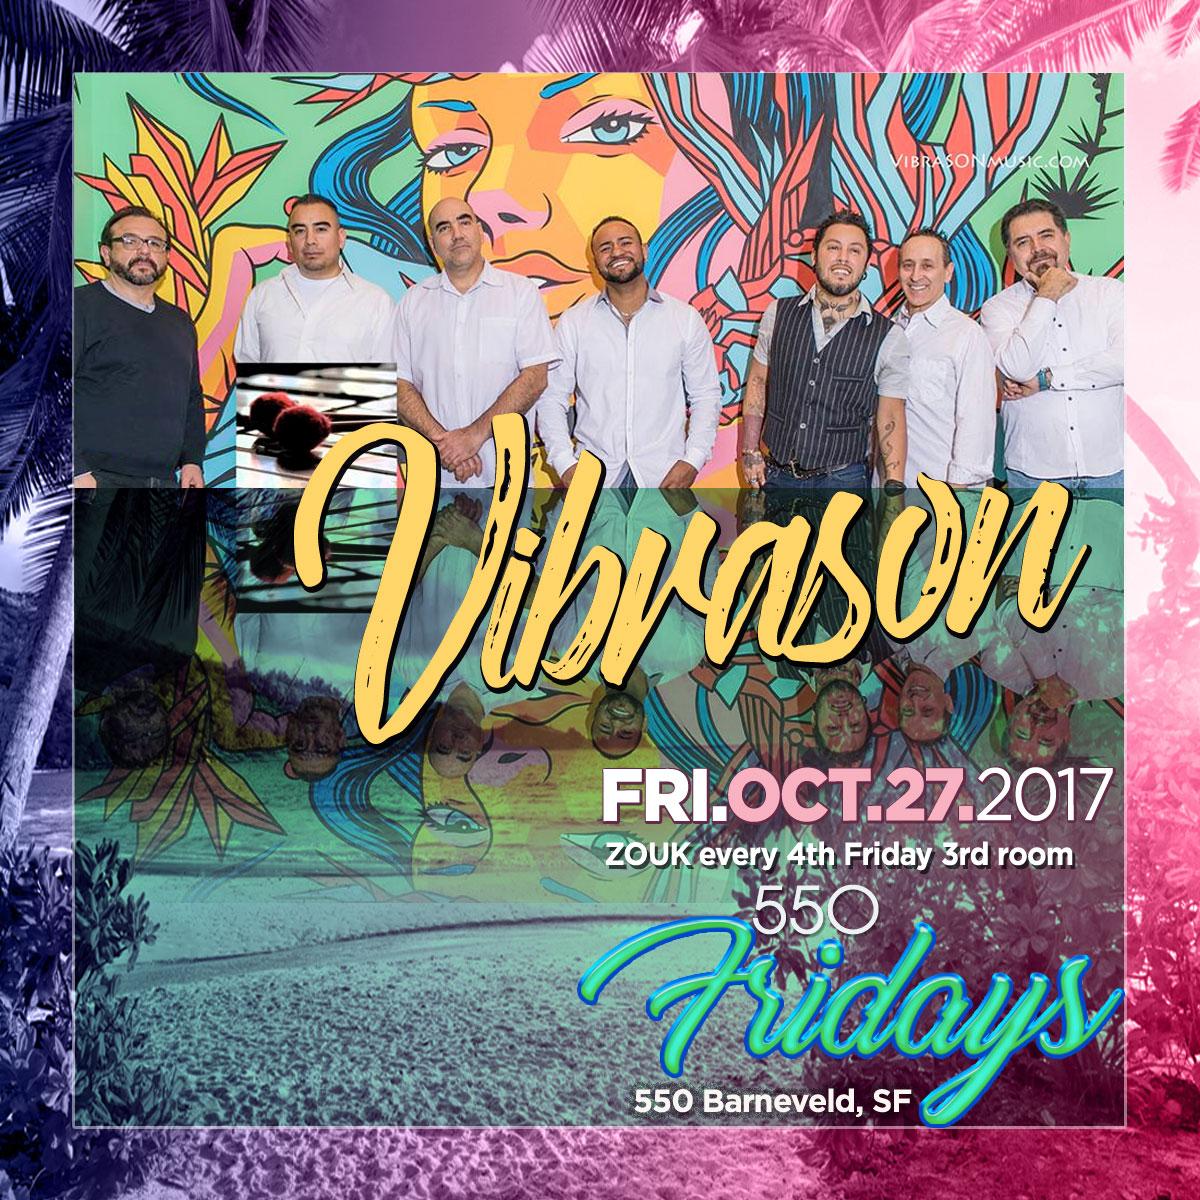 Dance Fridays at Space 550, 550 Barneveld, SF, 21+